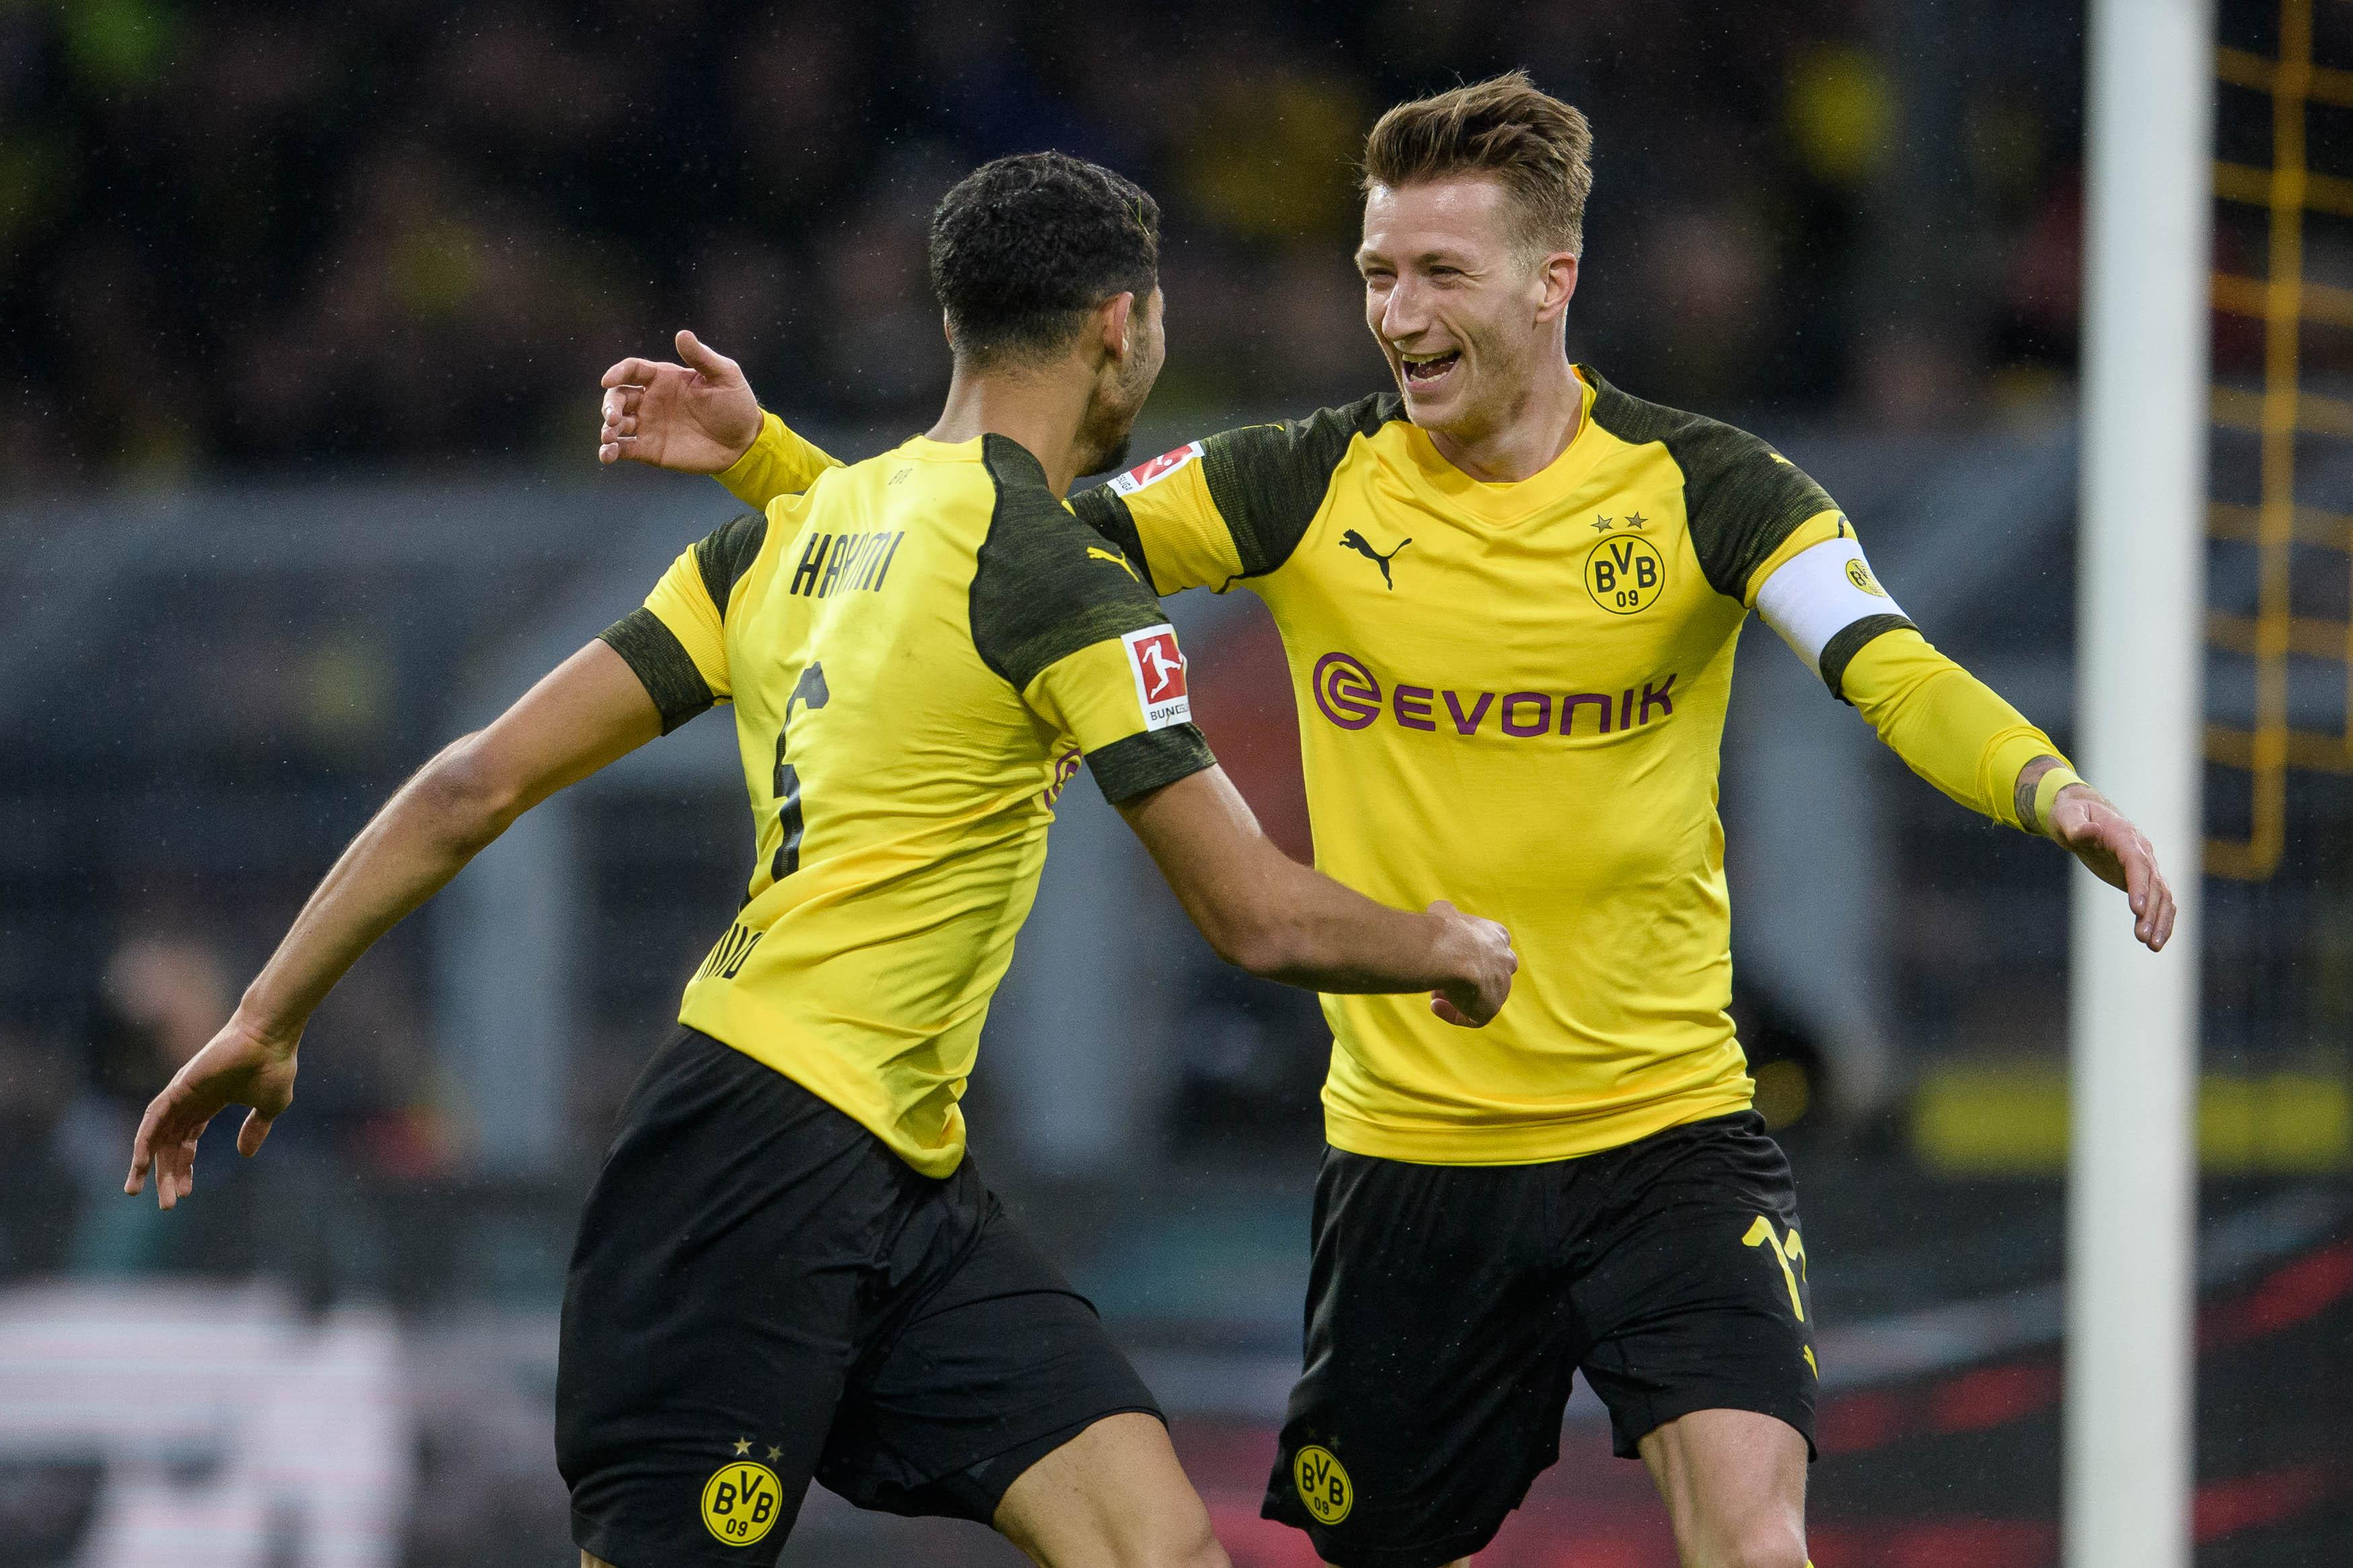 Fussball Heute Champions League Borussia Dortmund Fc